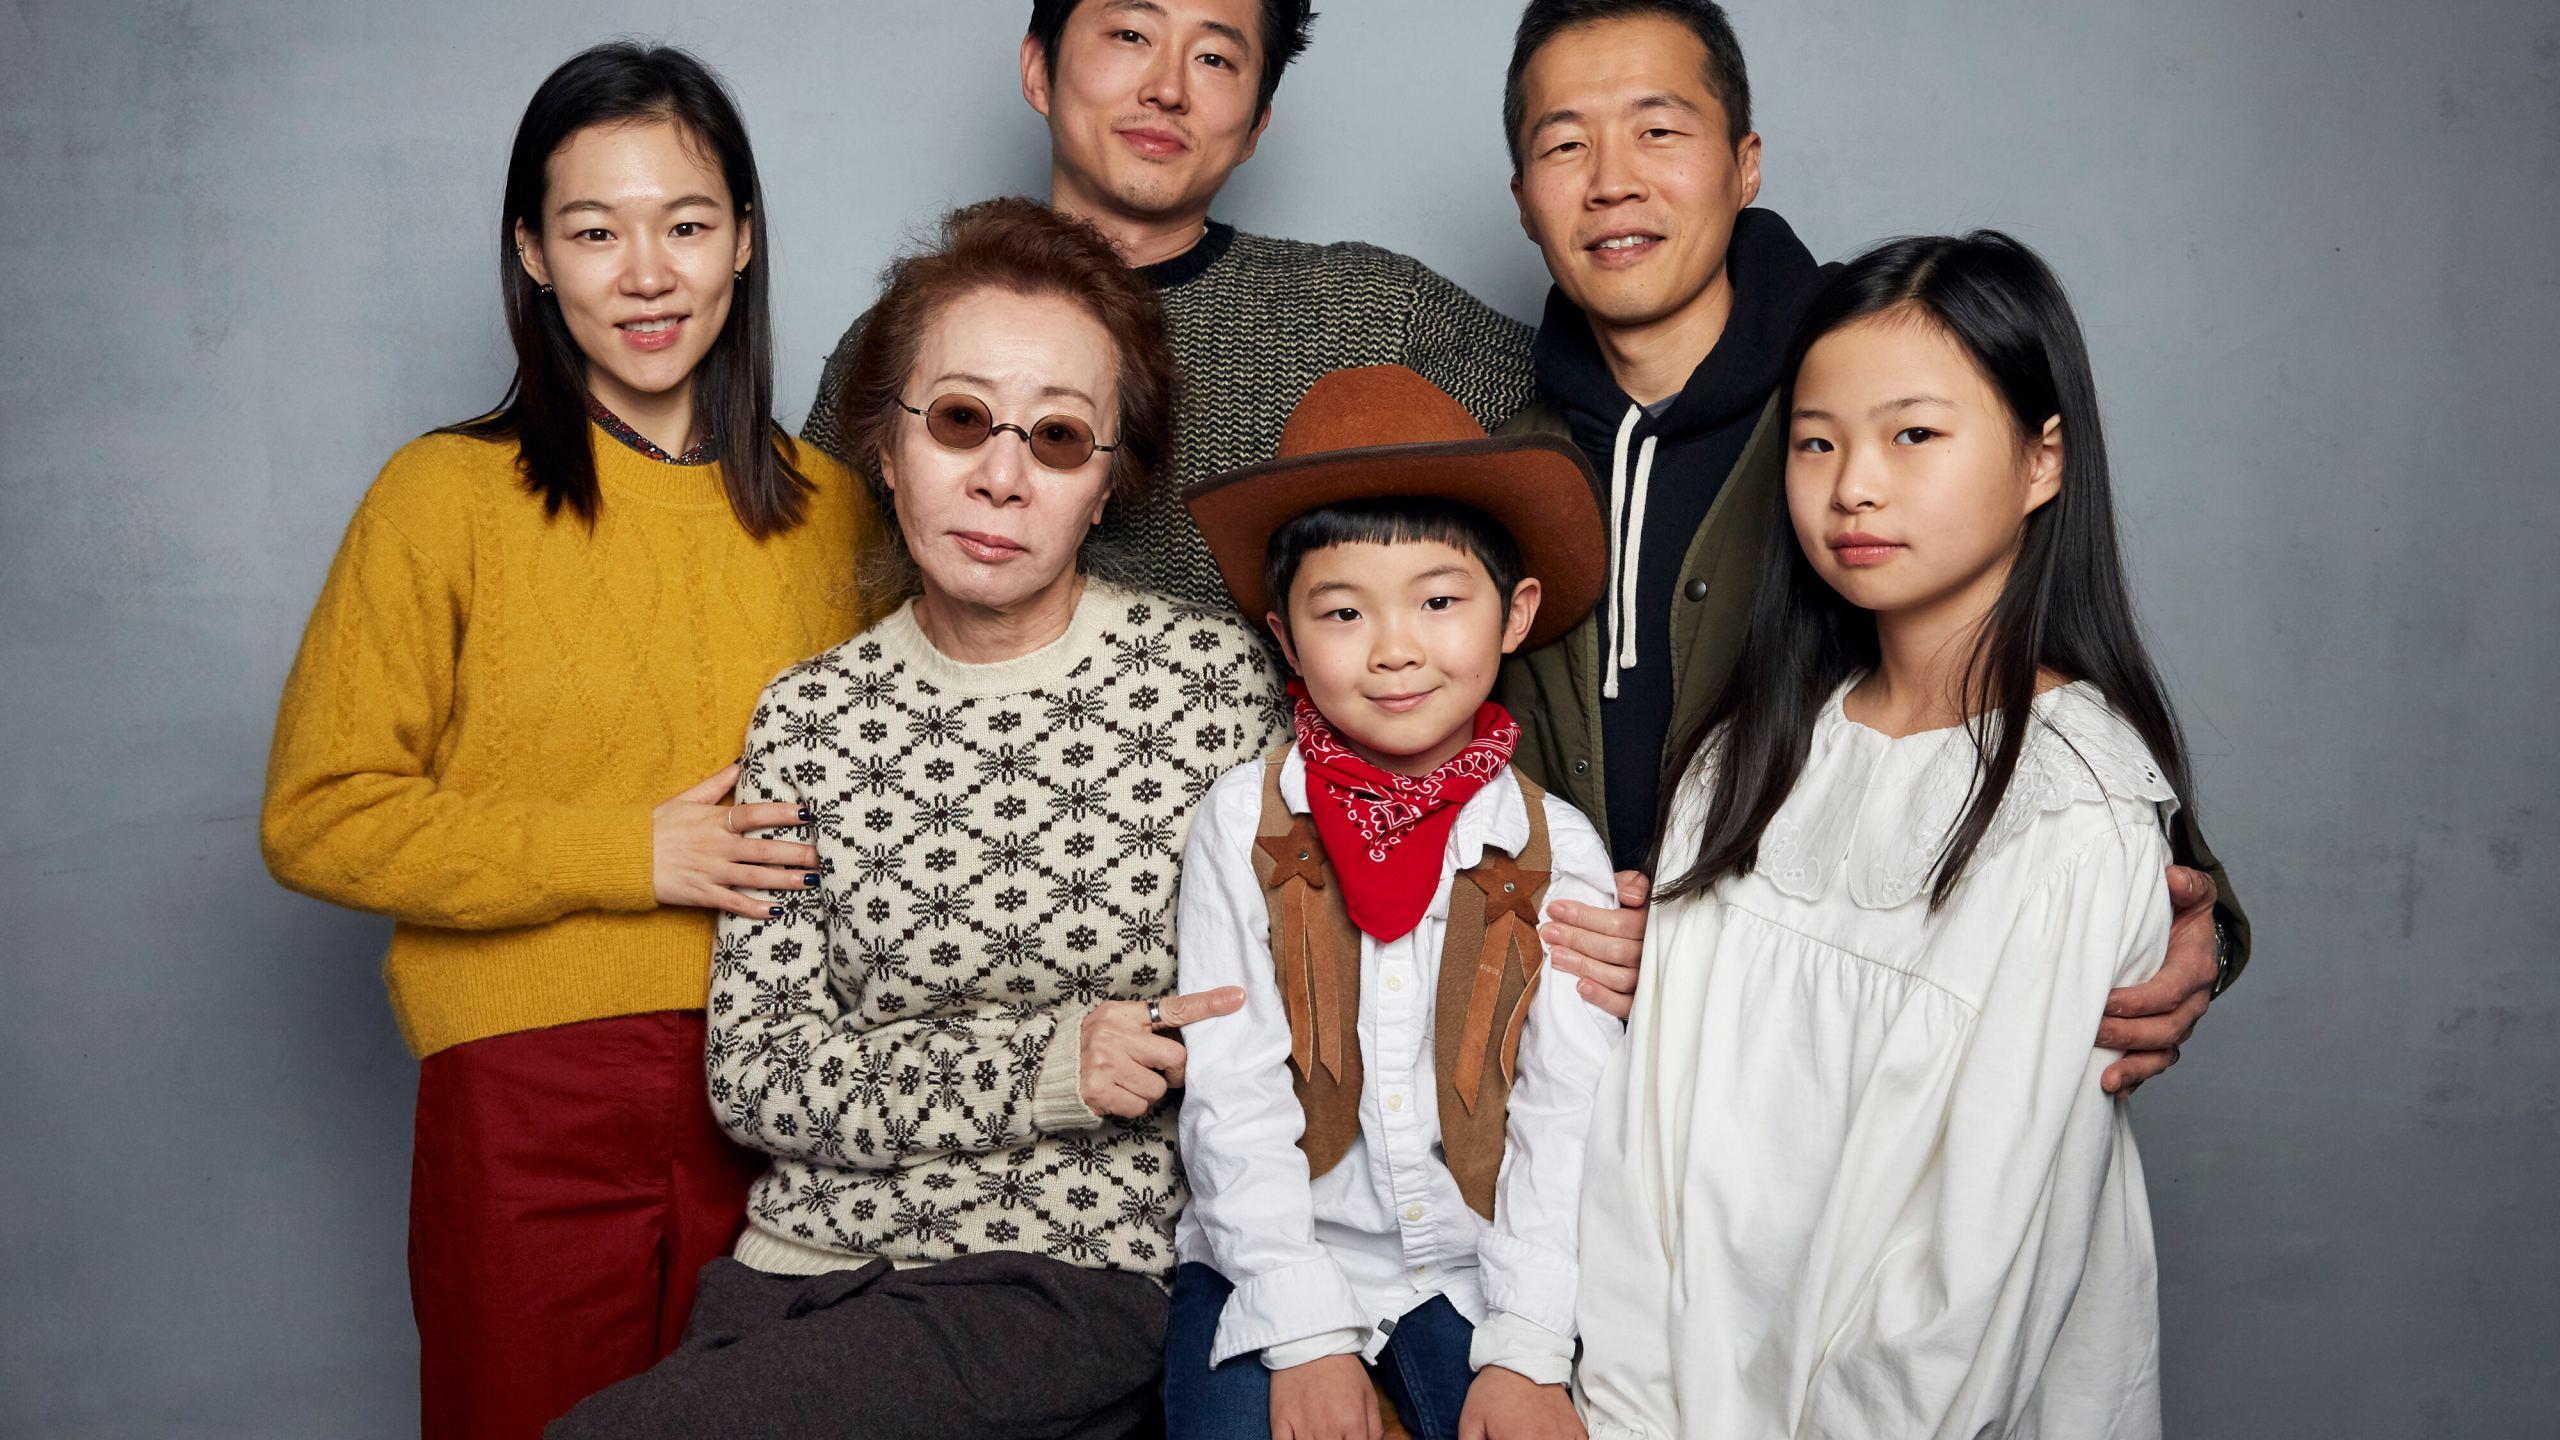 Han Yeri, Steven Yeun, Lee Isaac Chung, Yuh Jung Youn, Alan Kim, Noel Cho